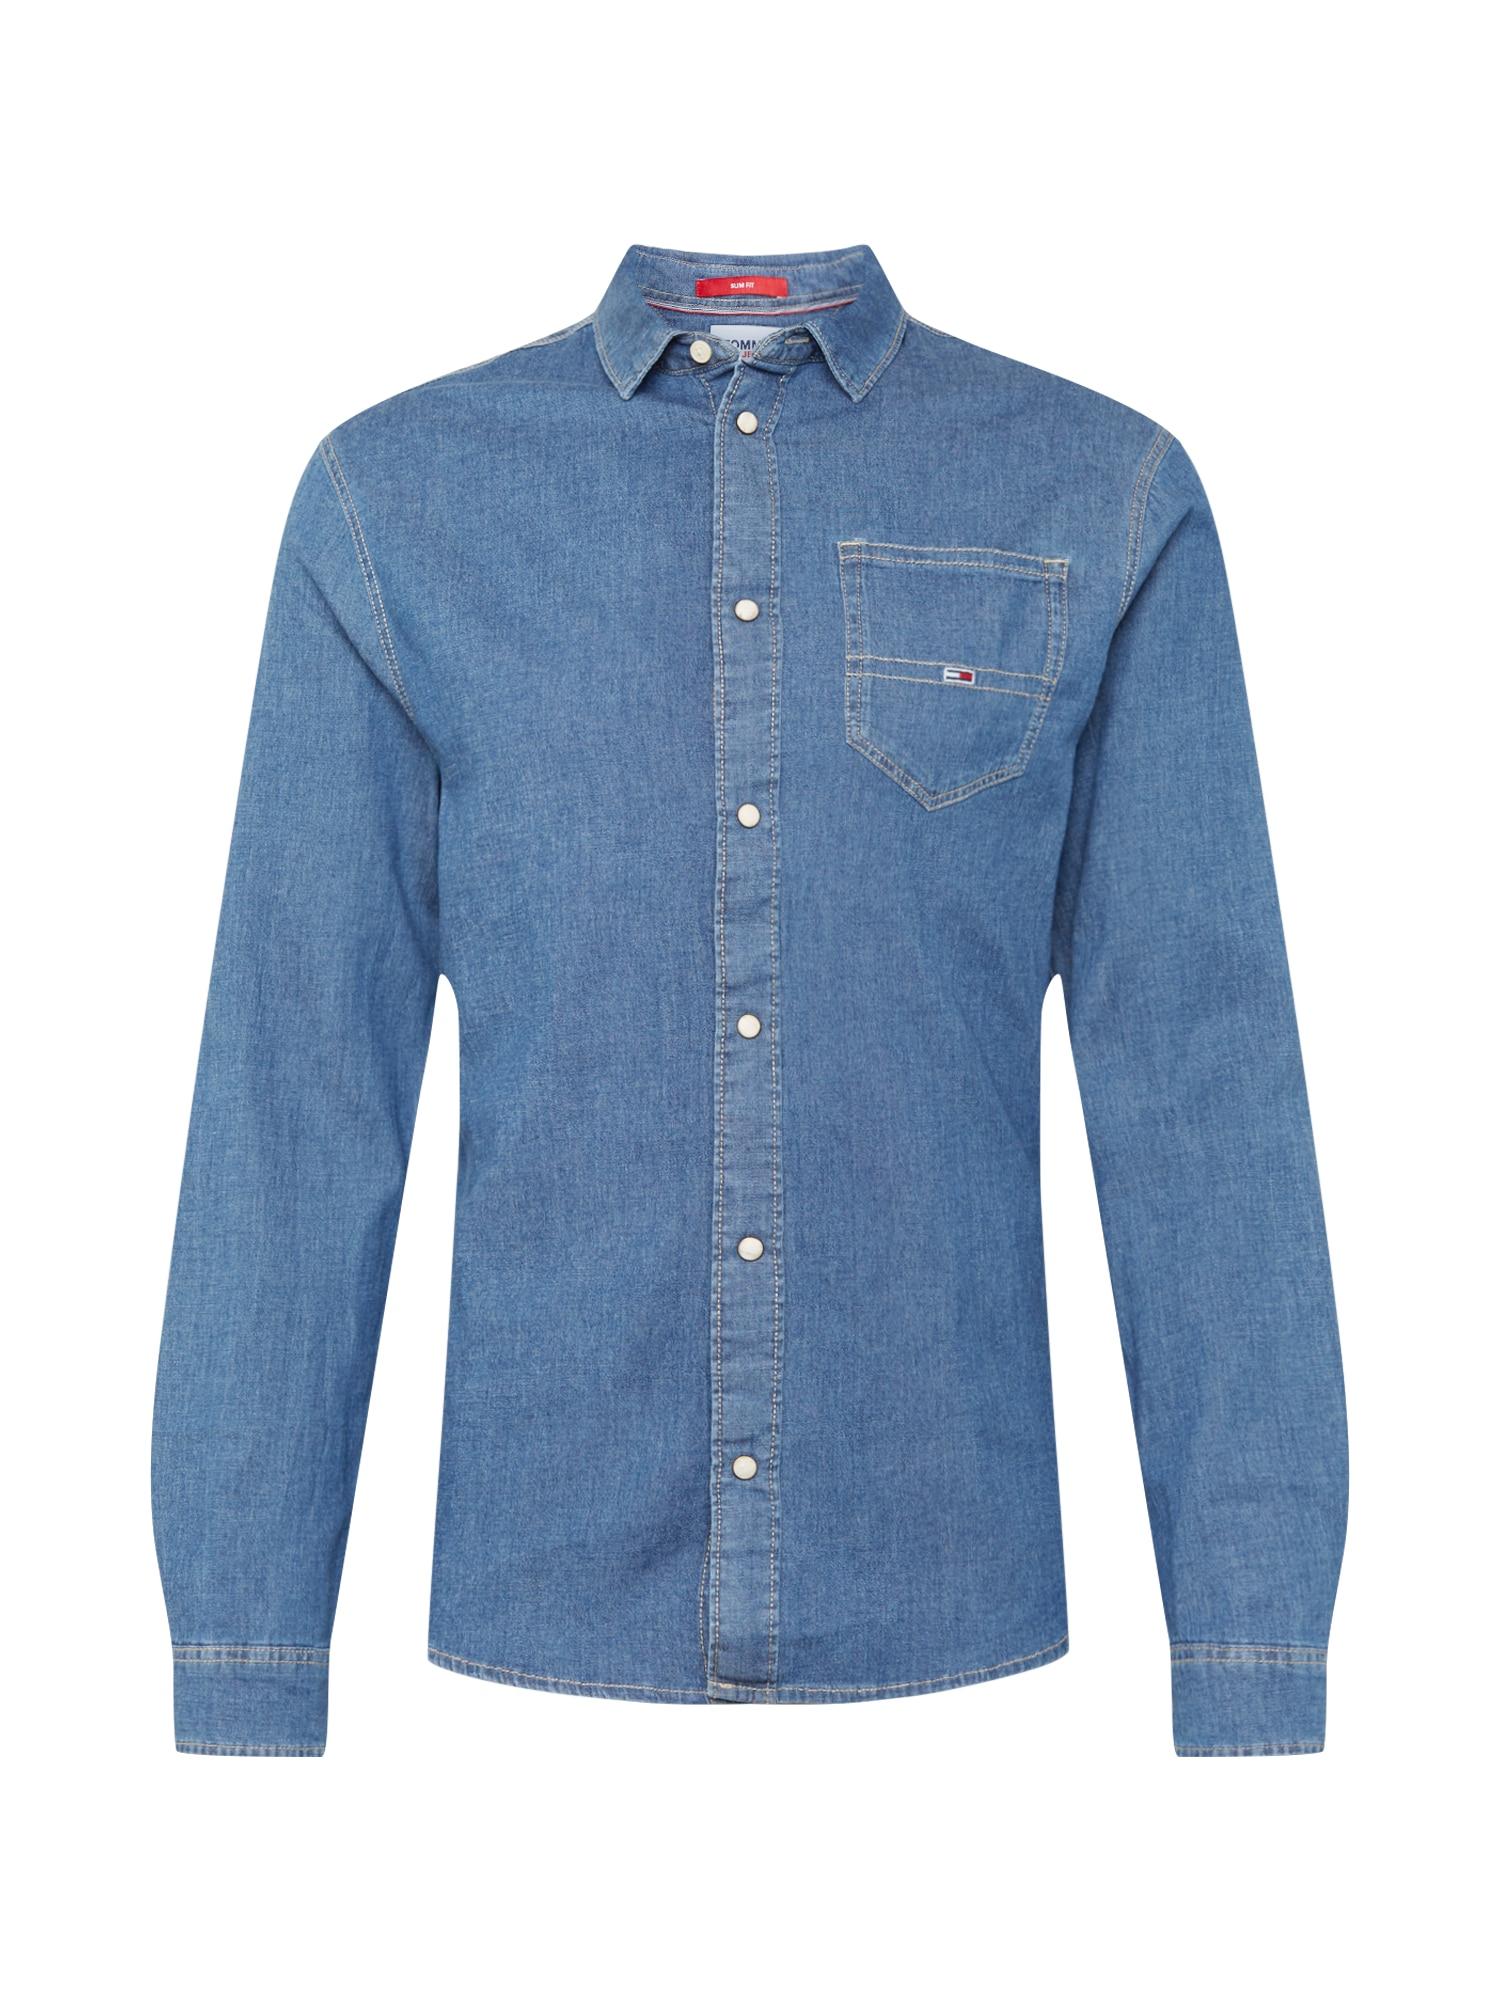 Tommy Jeans Marškiniai tamsiai (džinso) mėlyna